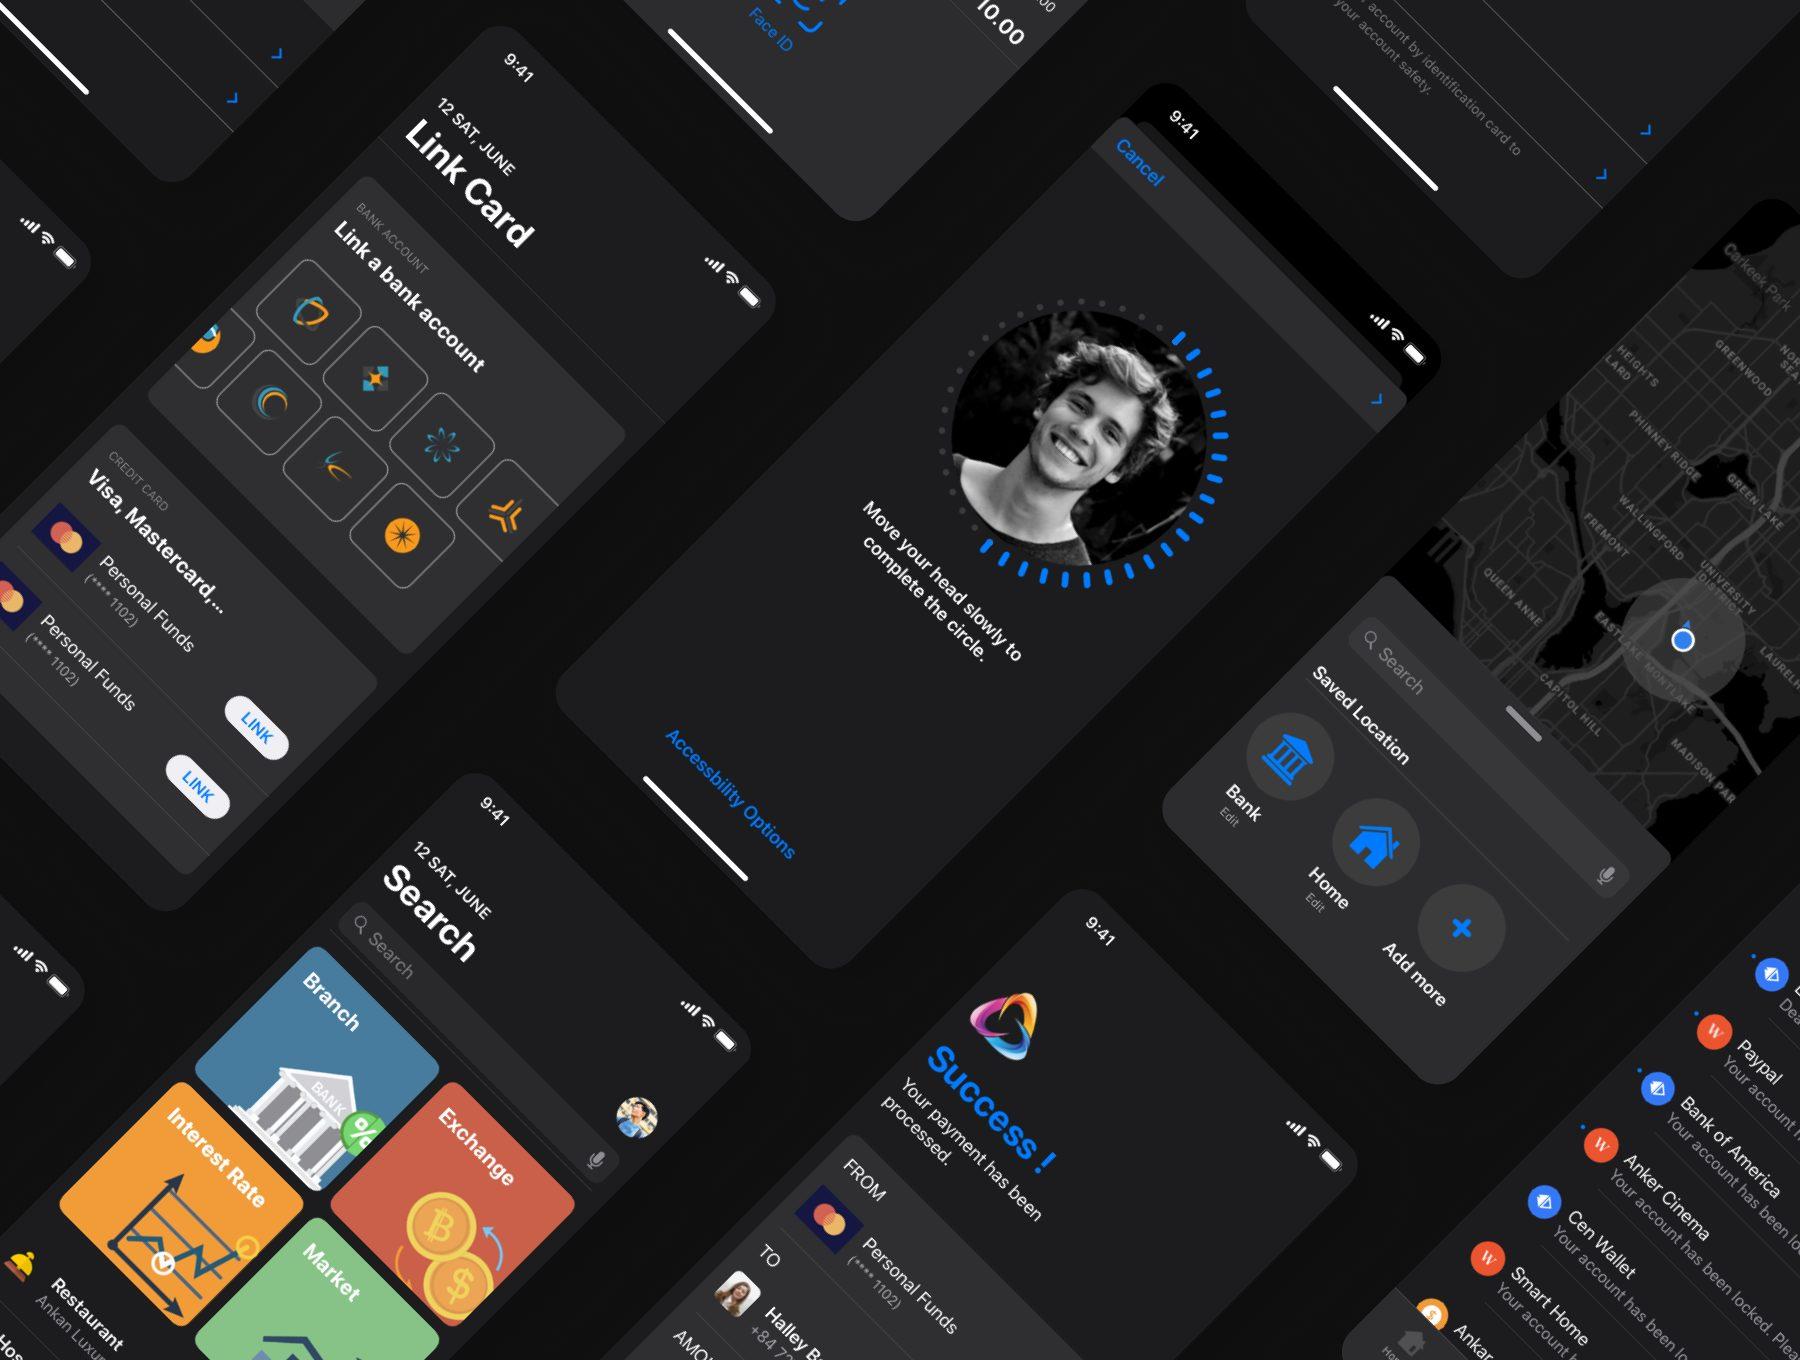 国际外汇金融APP设计产品套装iOS Ui下载[Sketch,iOS 13] Cadeep Finance App UI Kit design for sketch